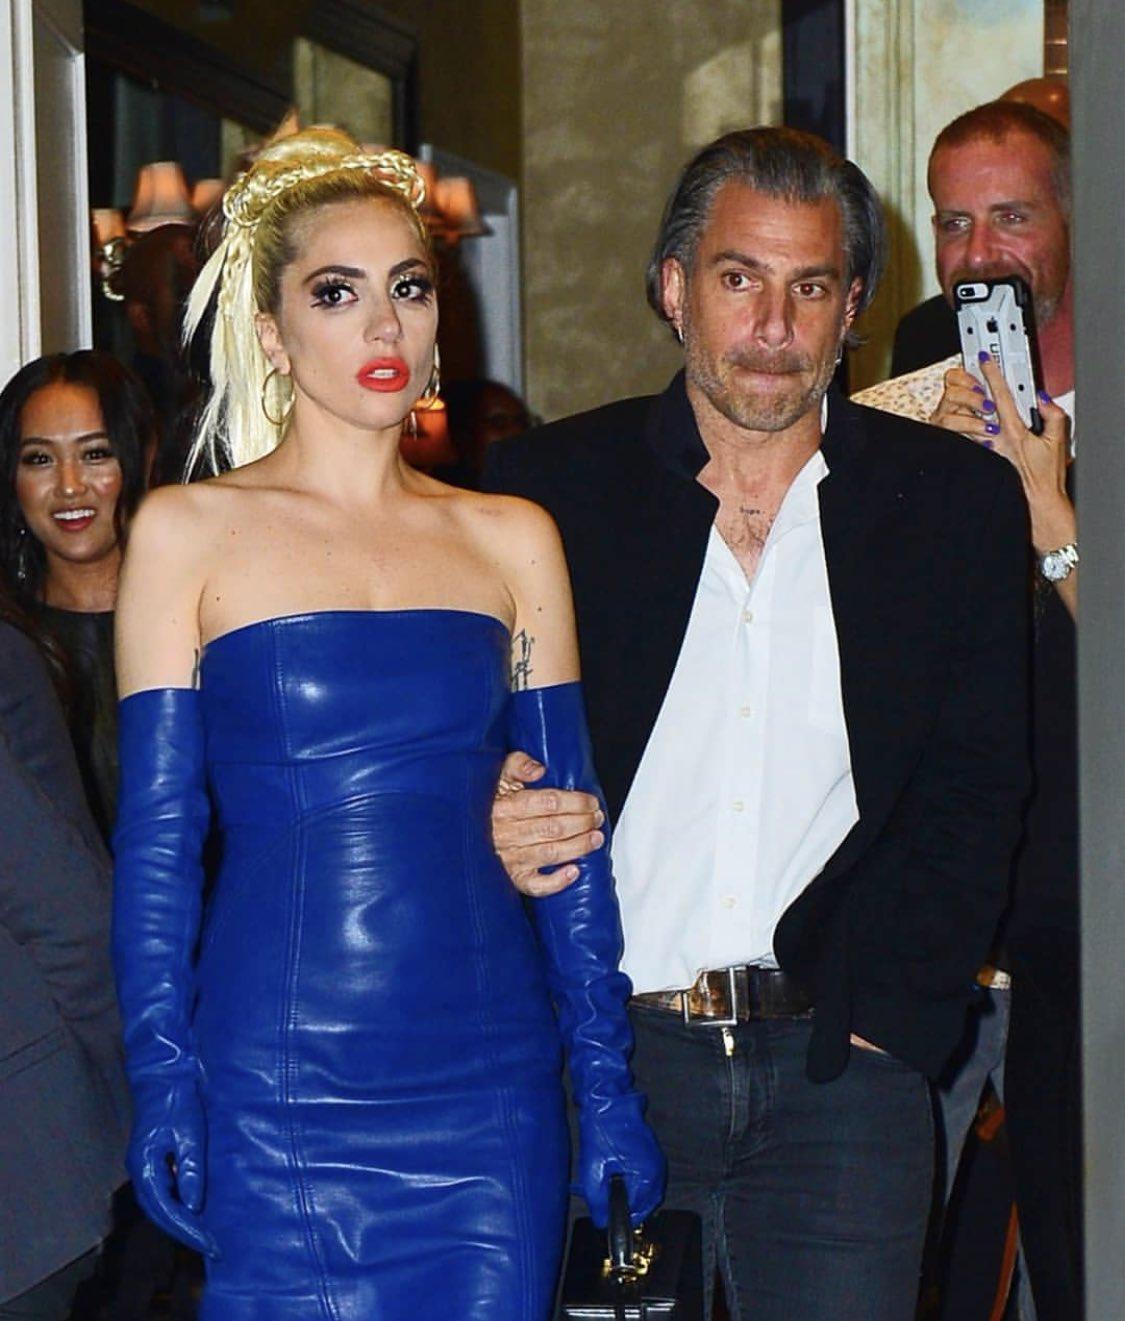 4 - Lady Gaga - Σελίδα 10 Zr8FbsSZvMU